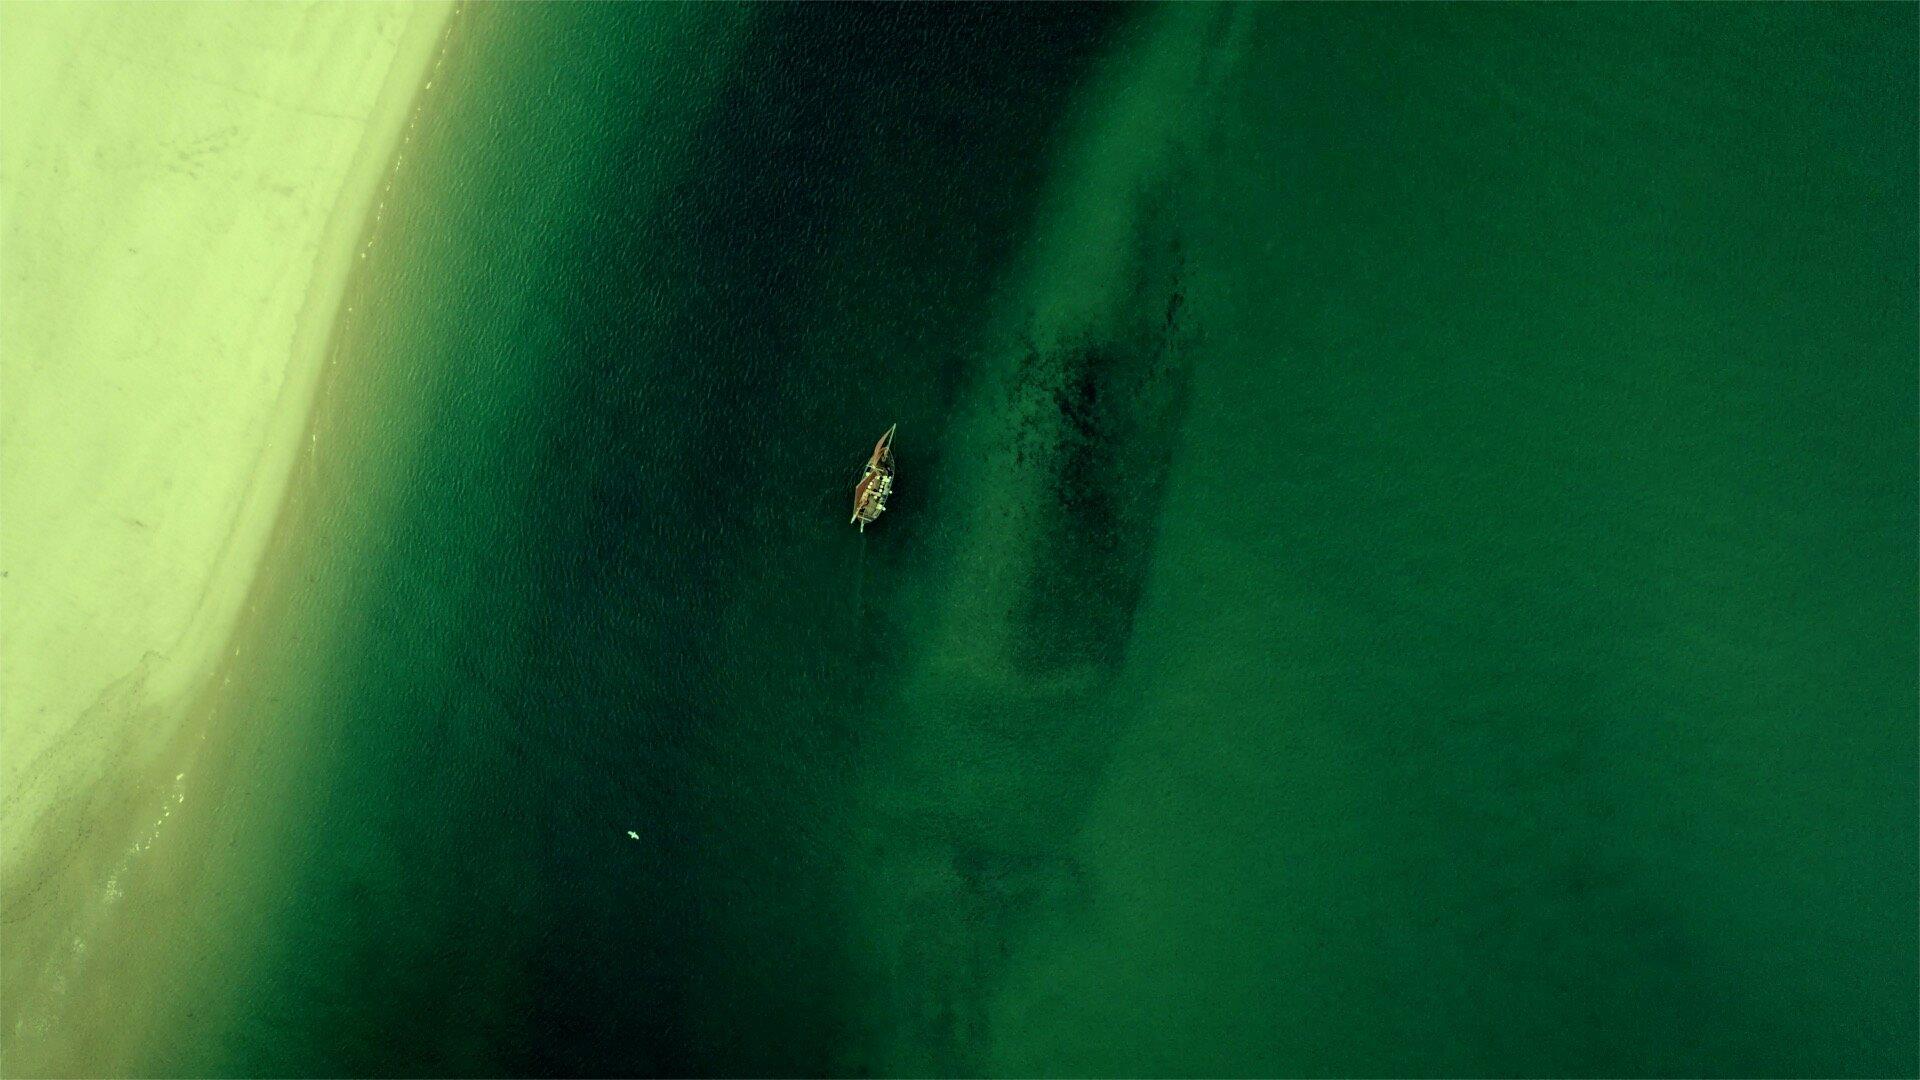 drone birds eye view.jpg